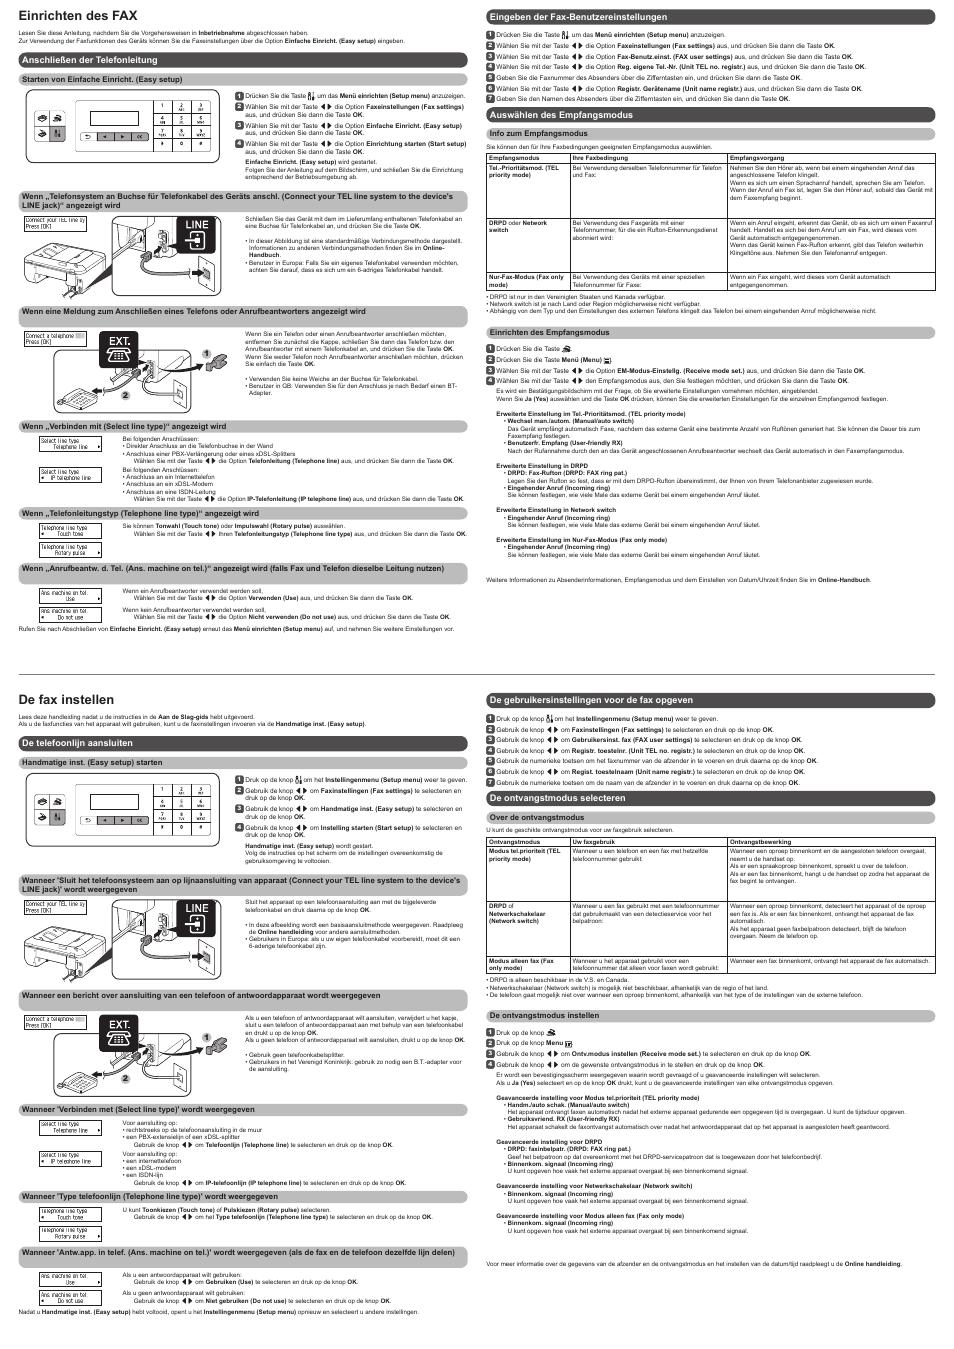 canon manuals fax